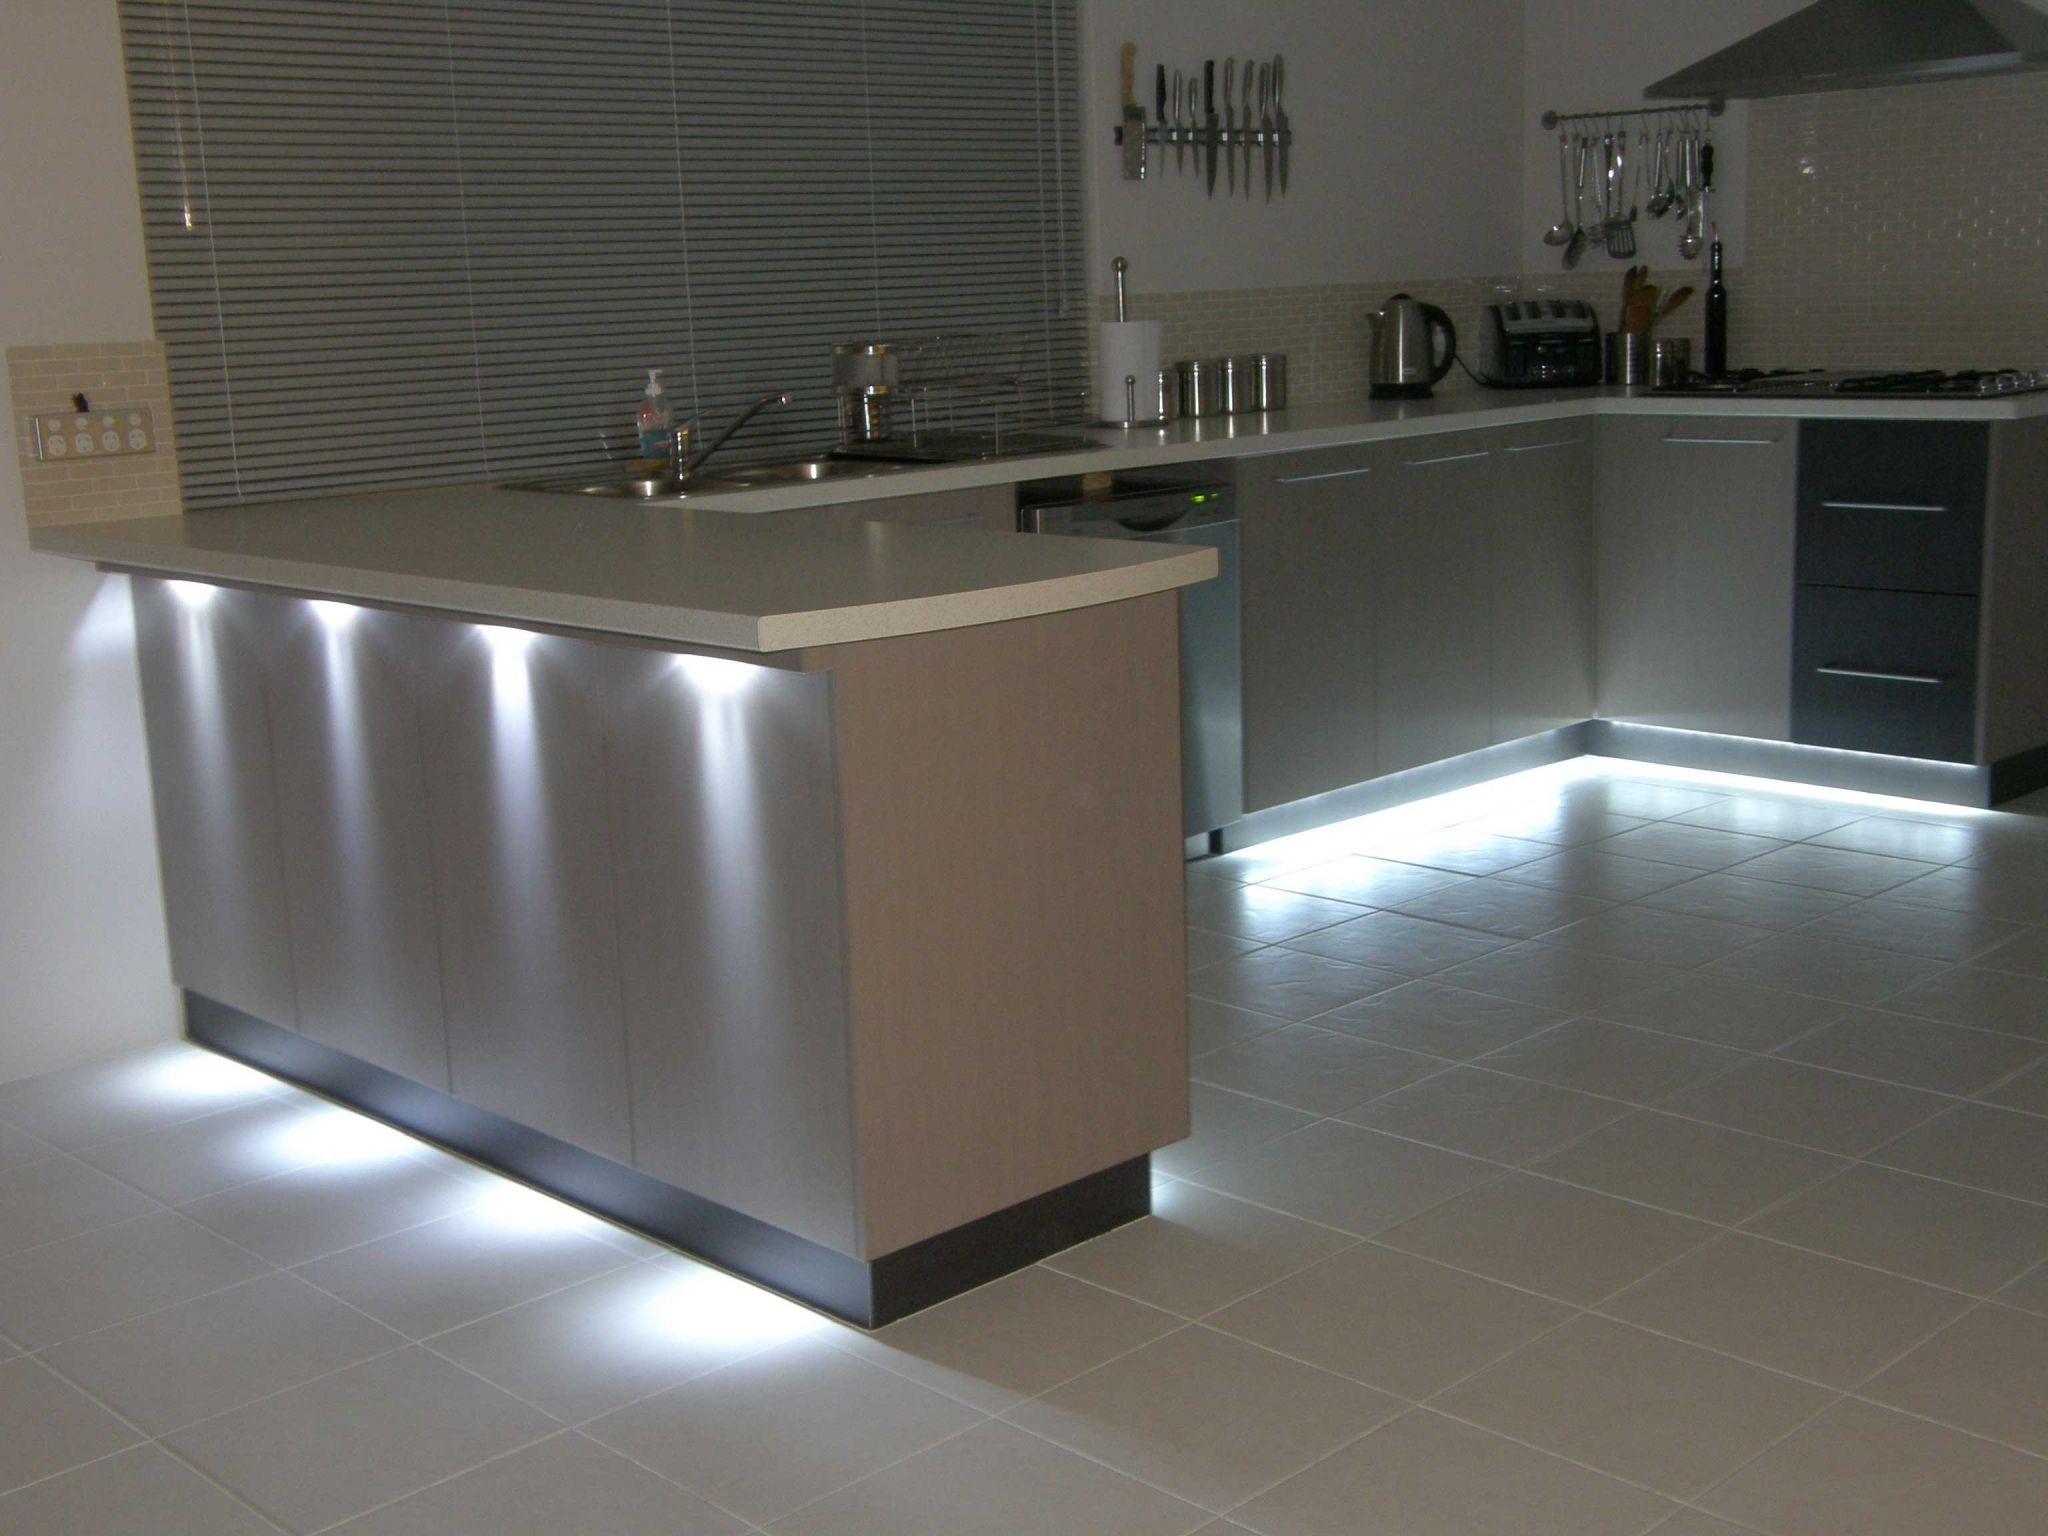 led kitchen cabinet lighting kitchen nook lighting ideas Check